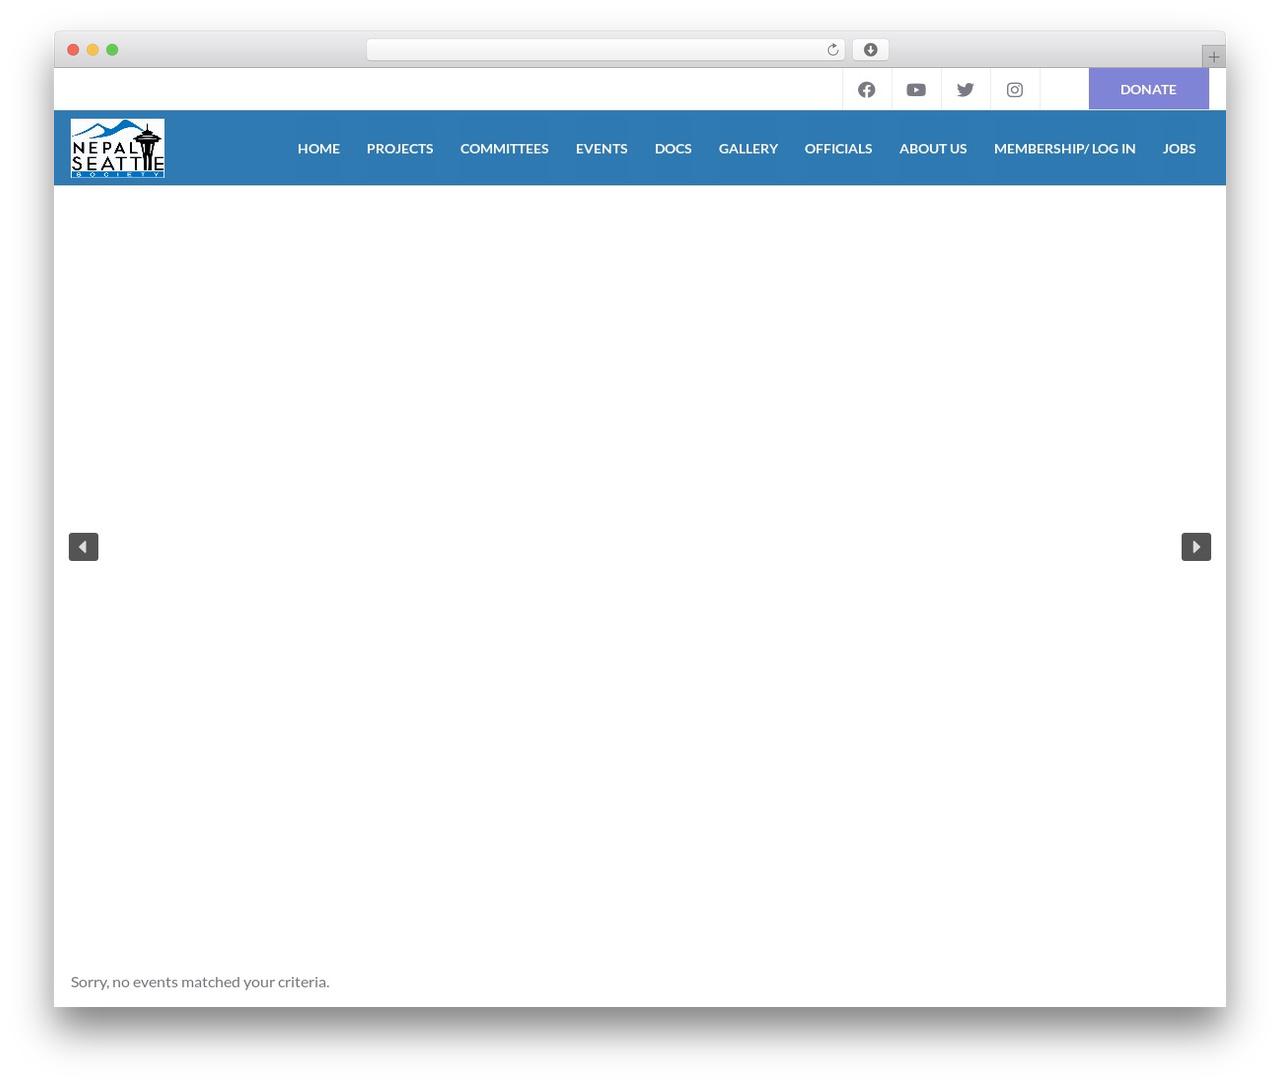 Charity WPL WordPress theme design - nepalseattle.org